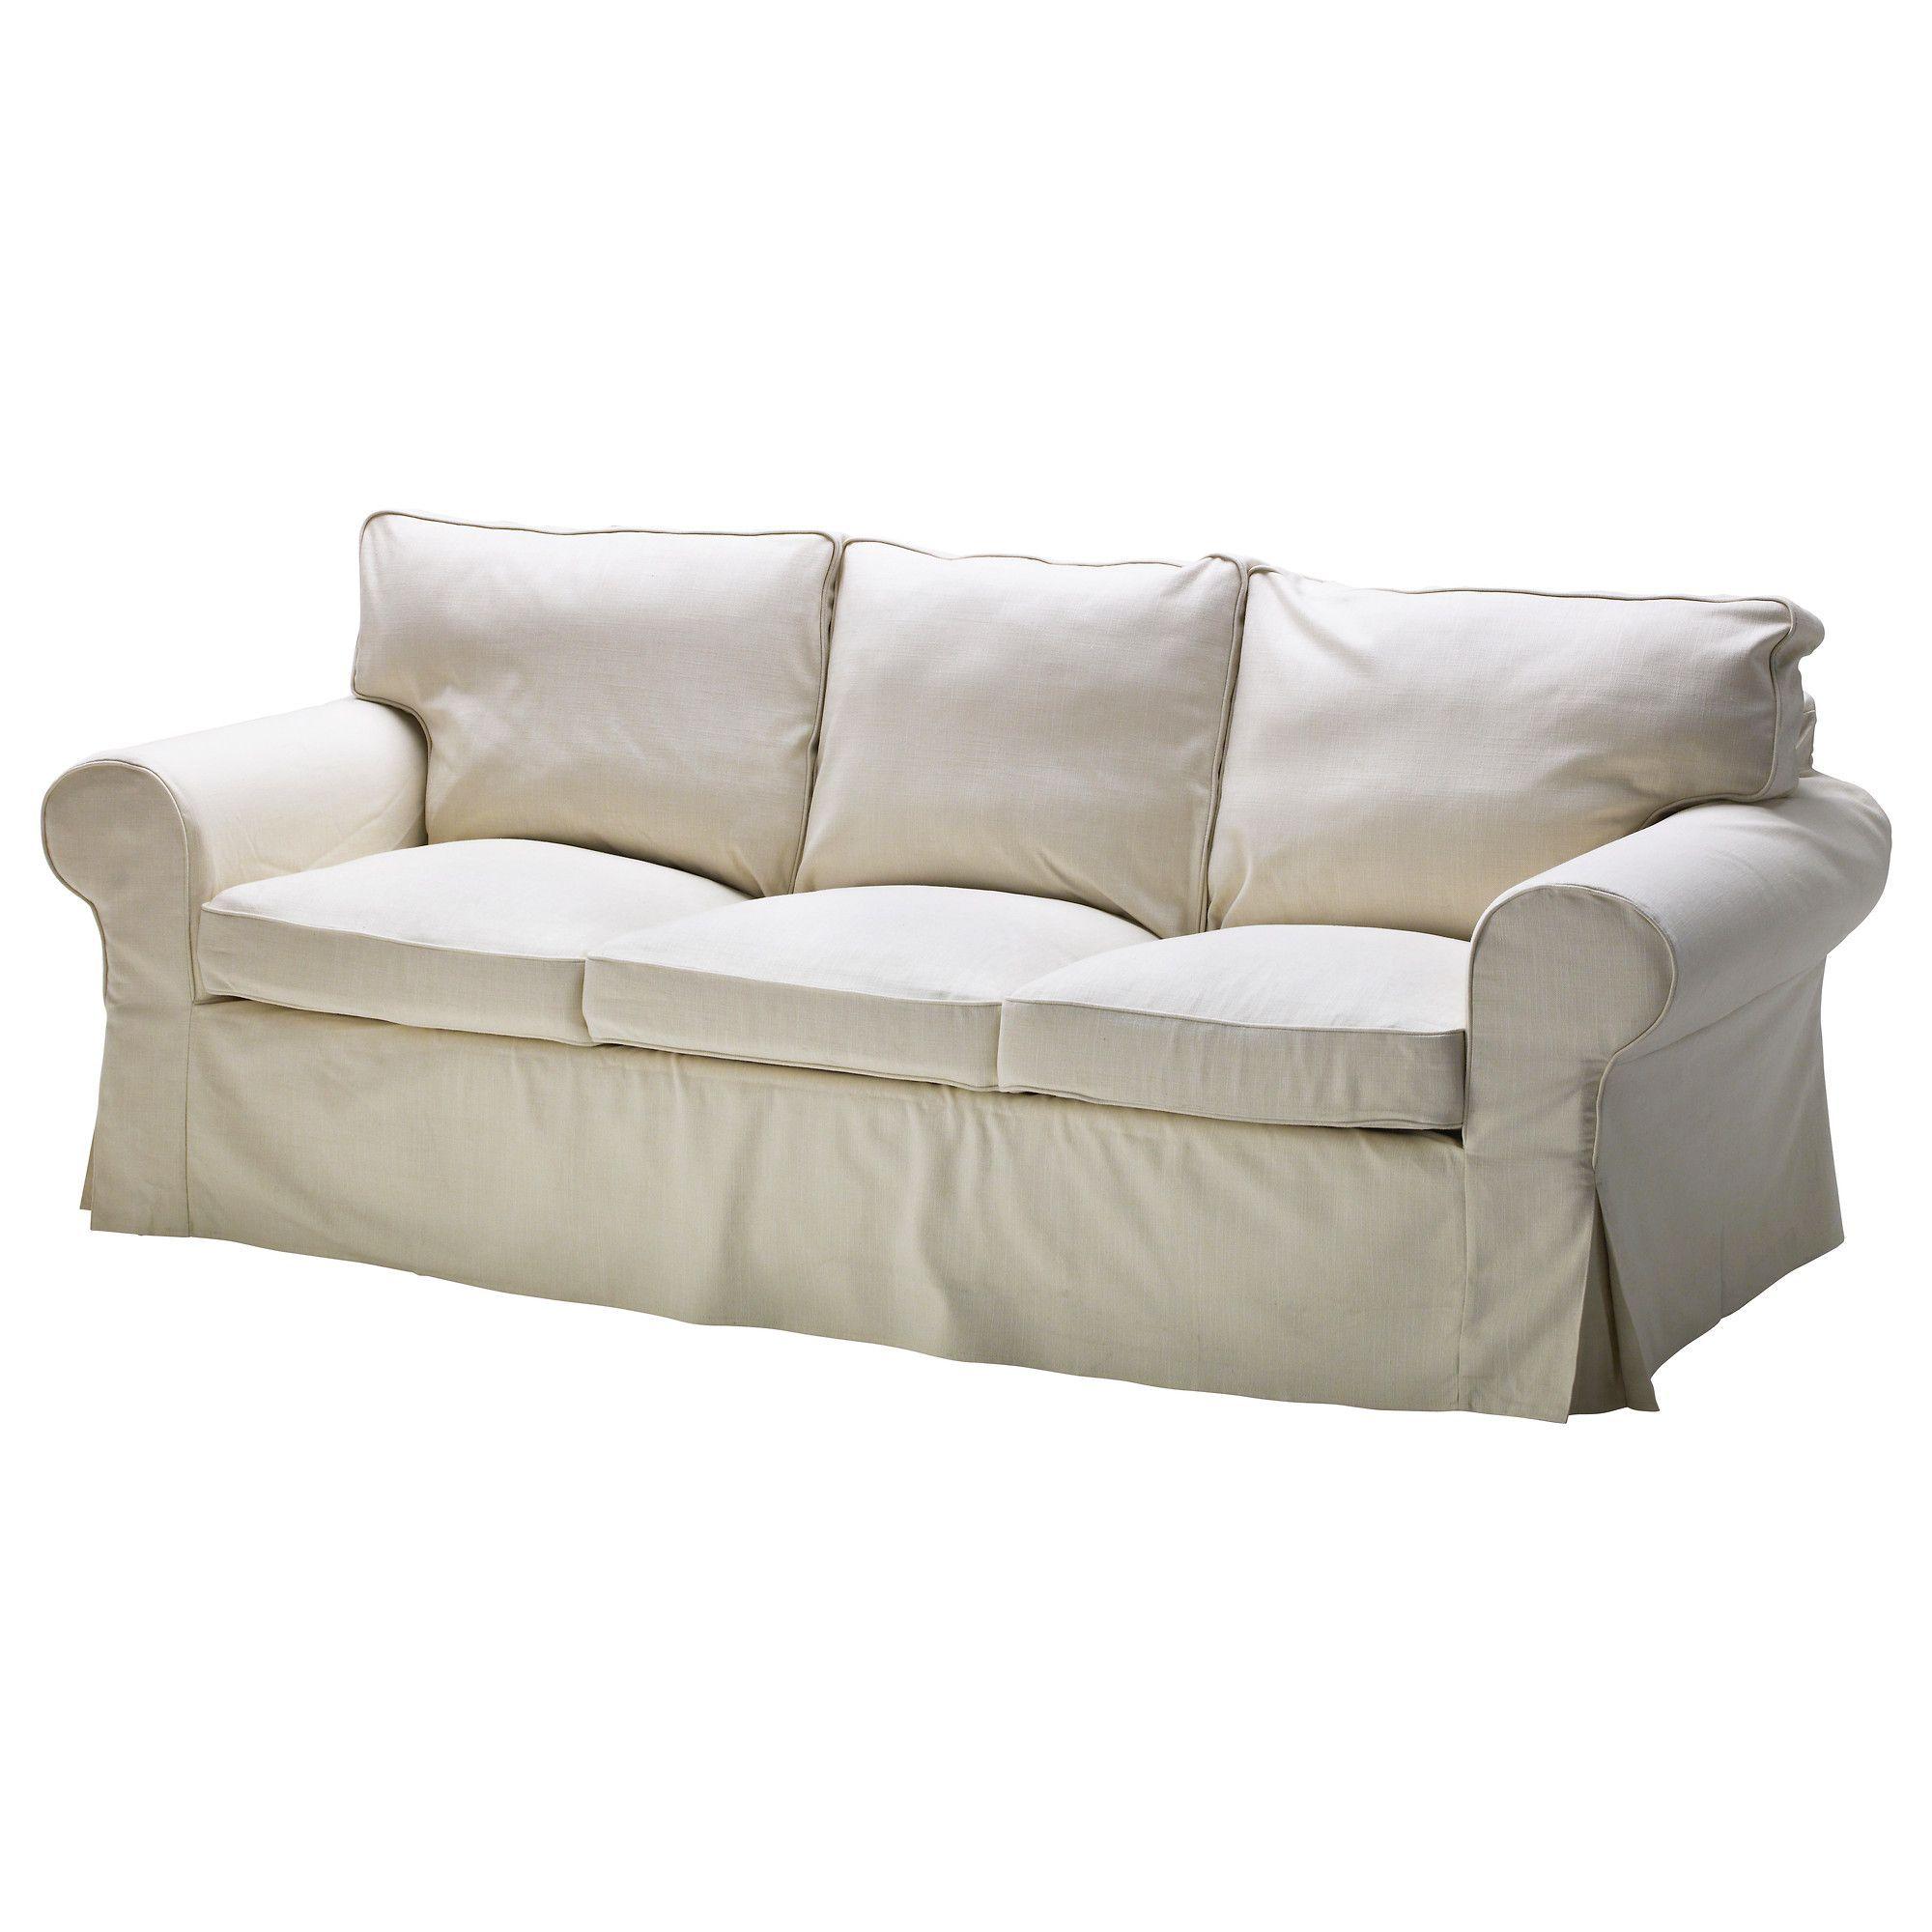 22 Inspirierende Ikea Hovas Sofa Ikea Ektorp Sofa Couch